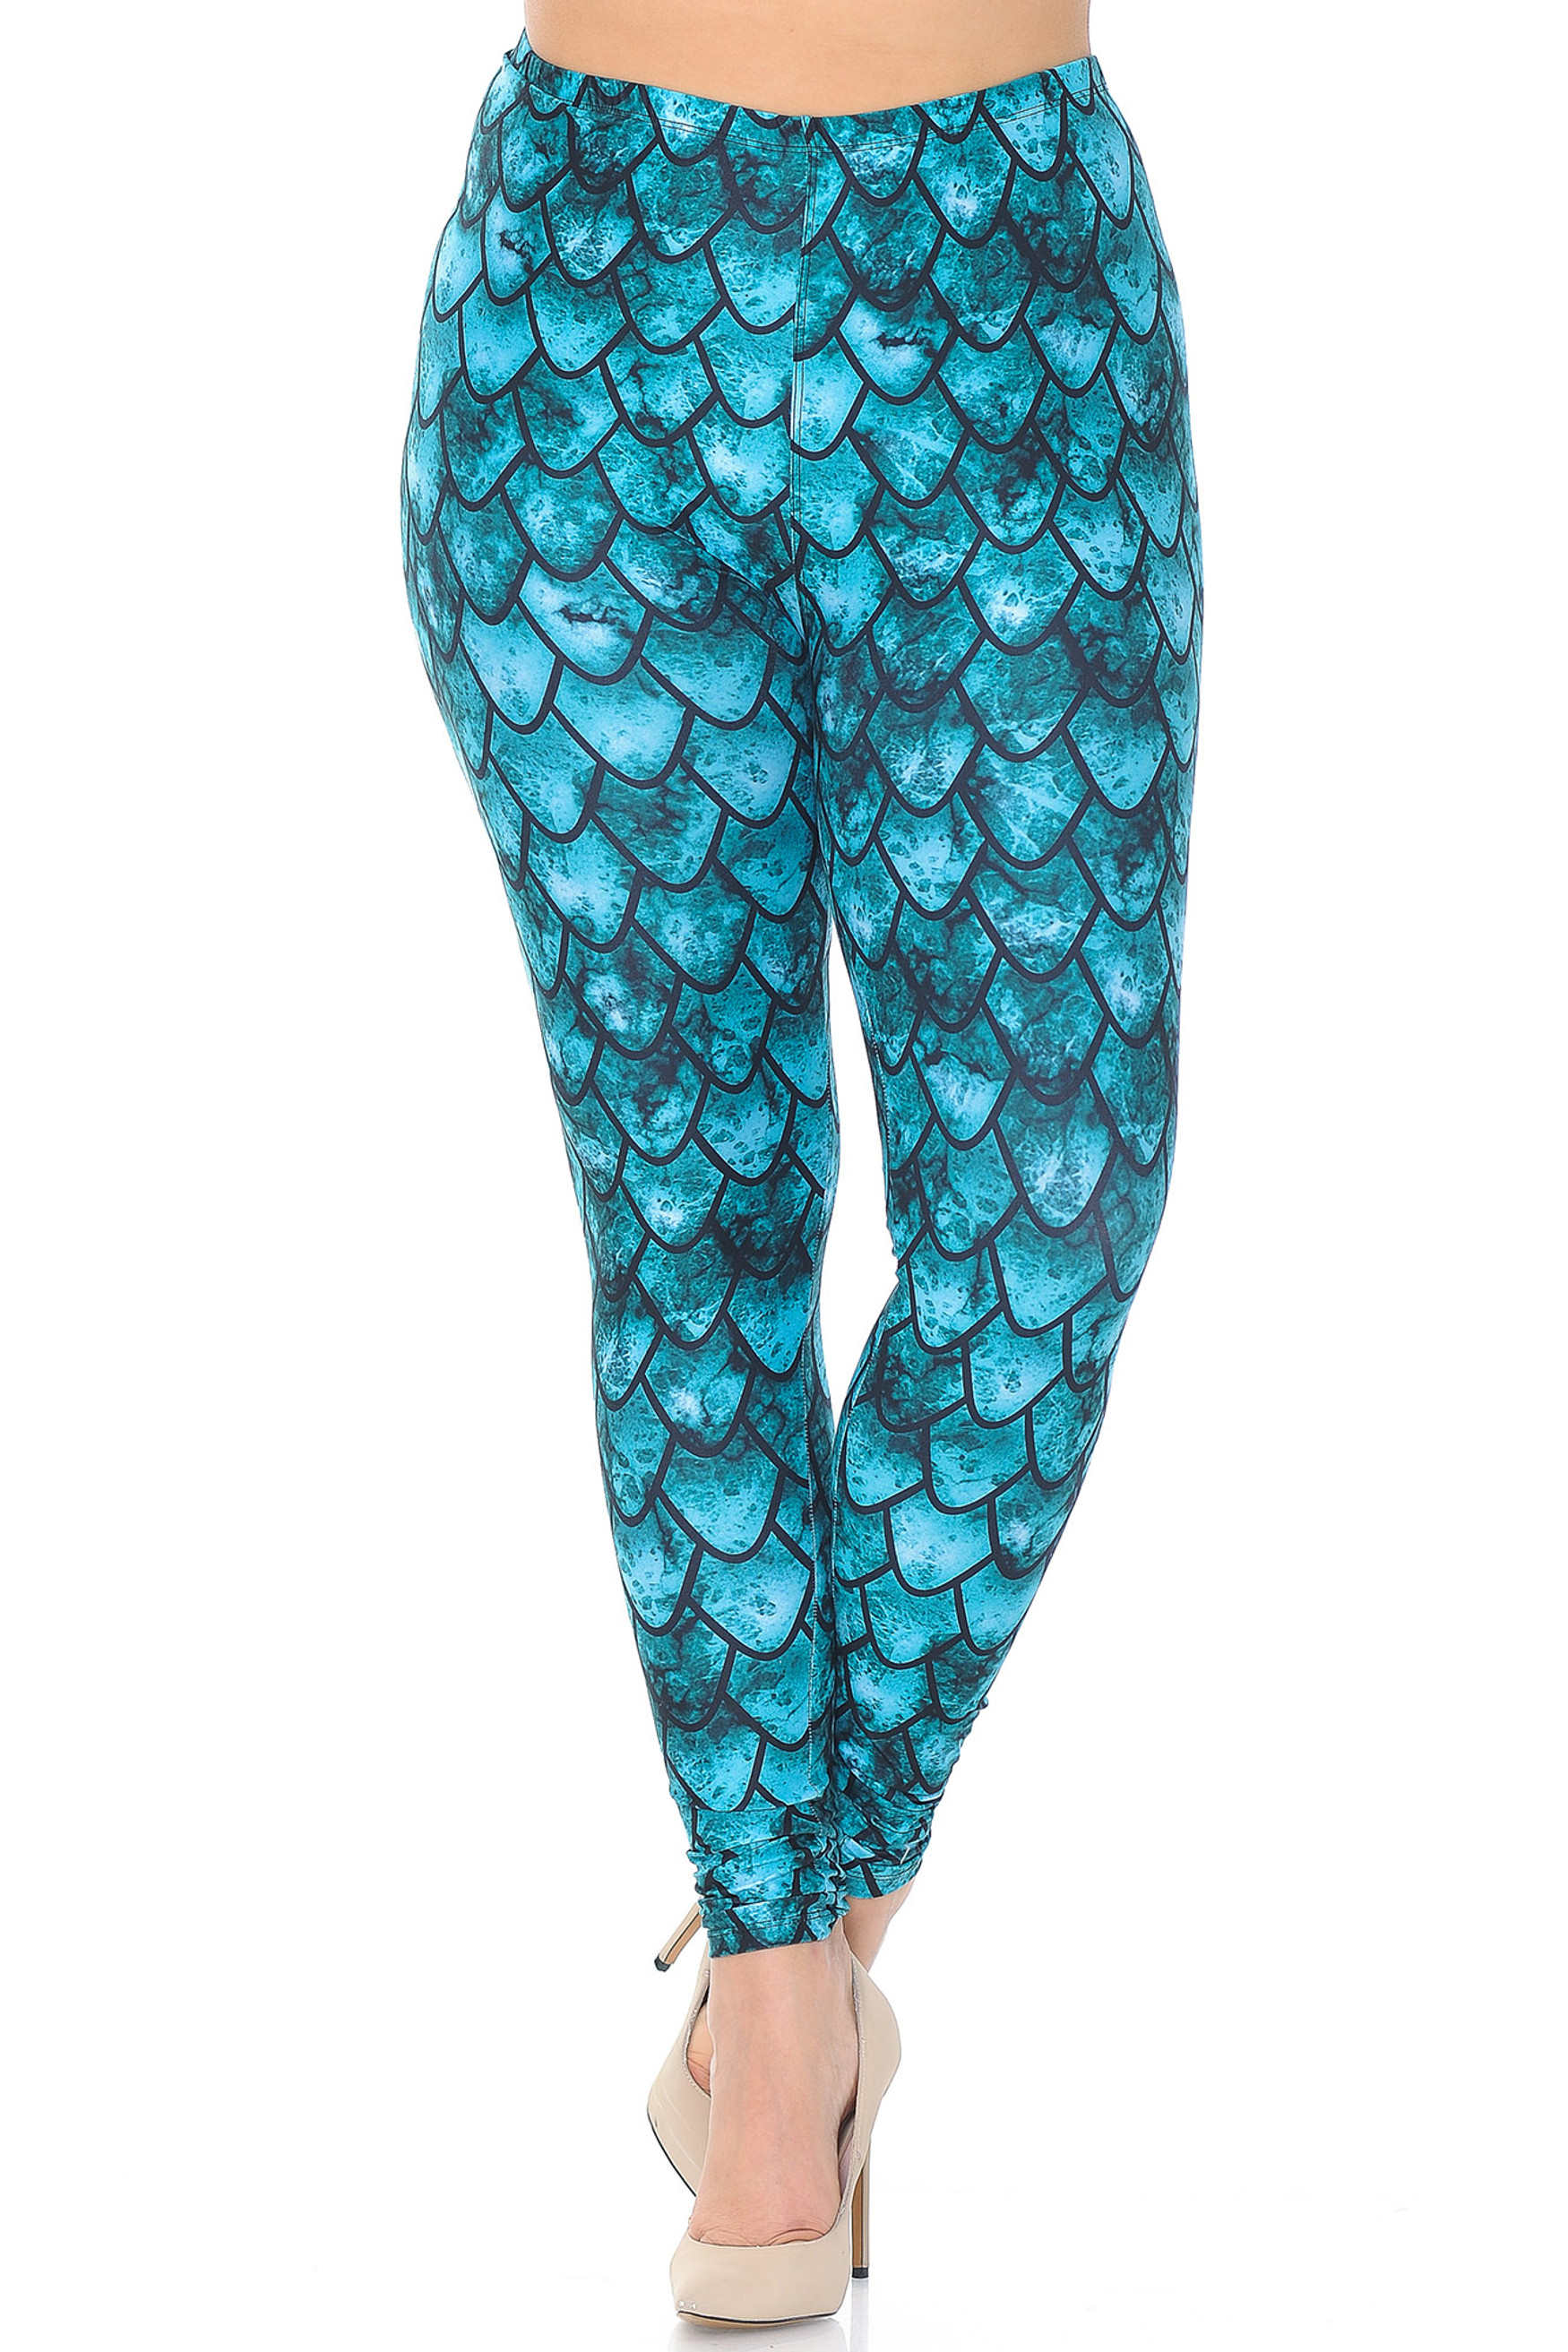 Creamy Soft Green Dragon Plus Size Leggings - USA Fashion™